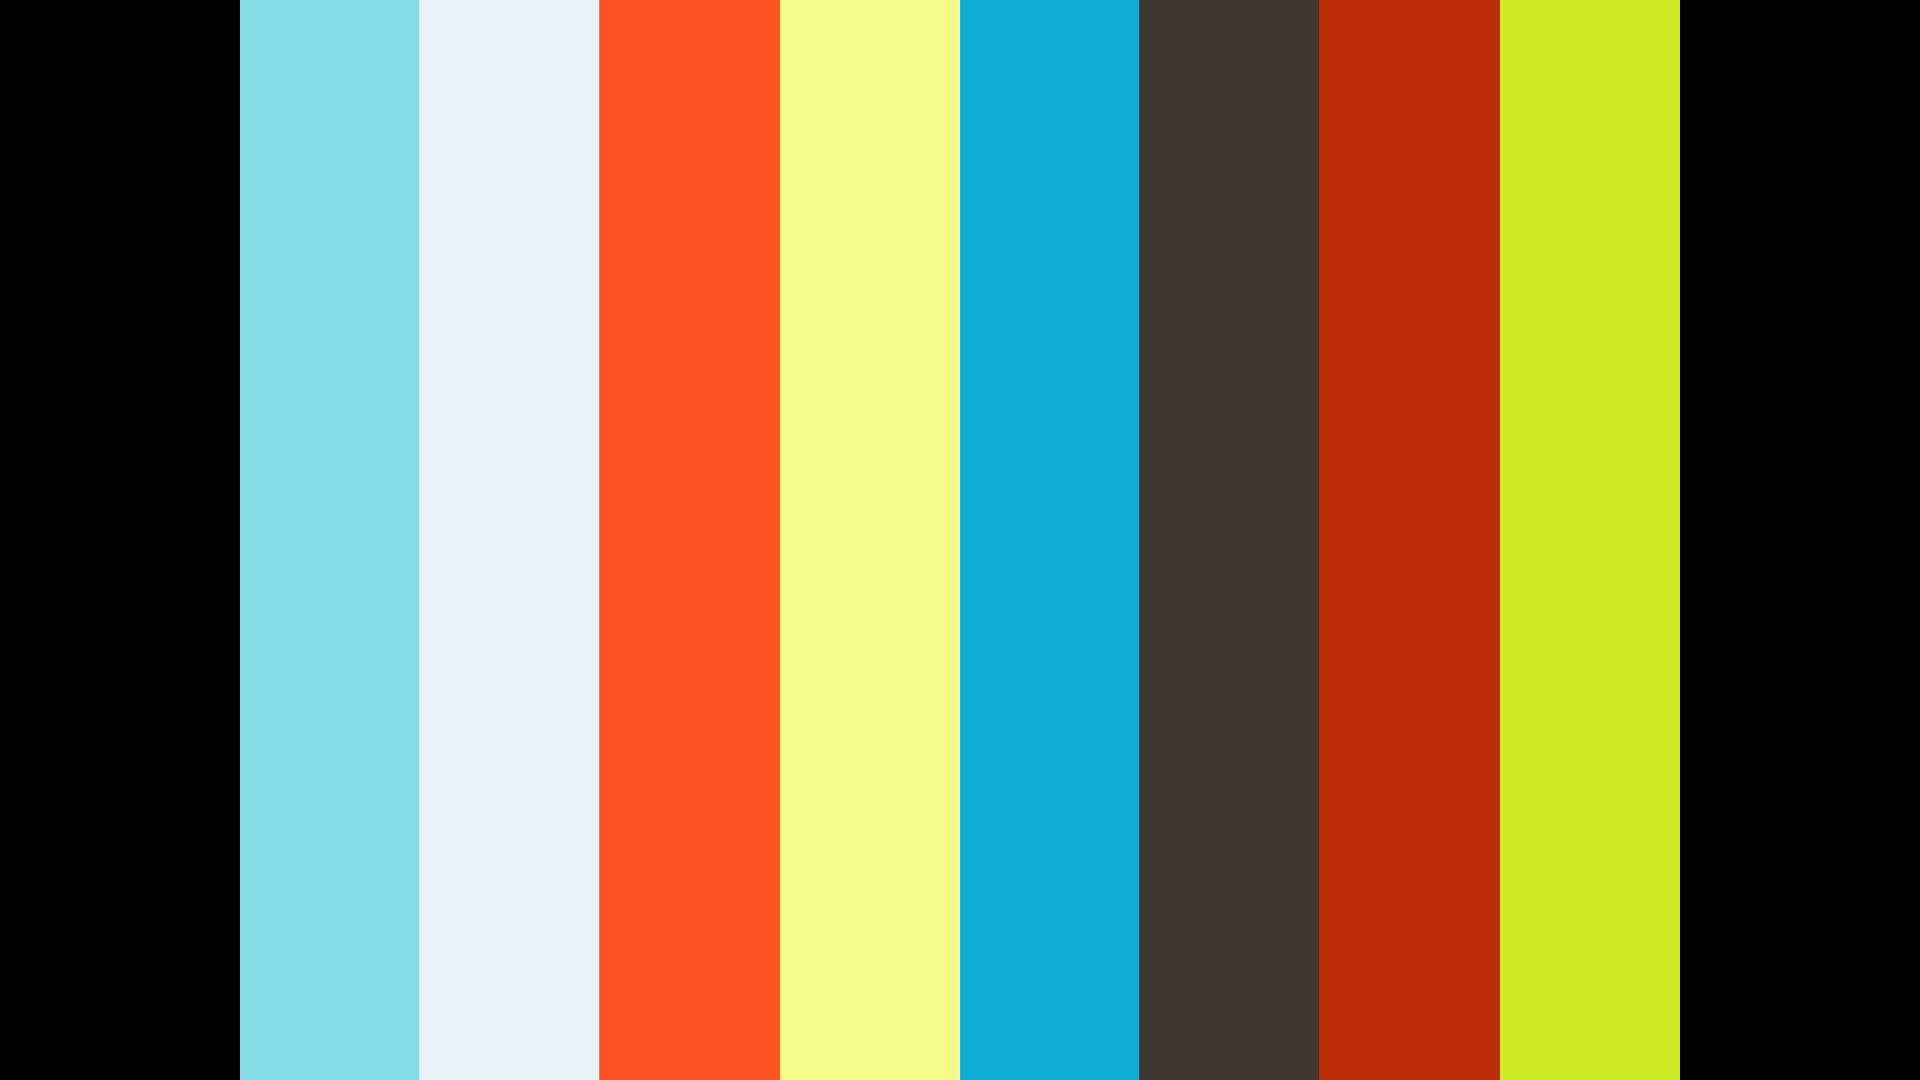 11_18_2020 - Spades - Turn Probes